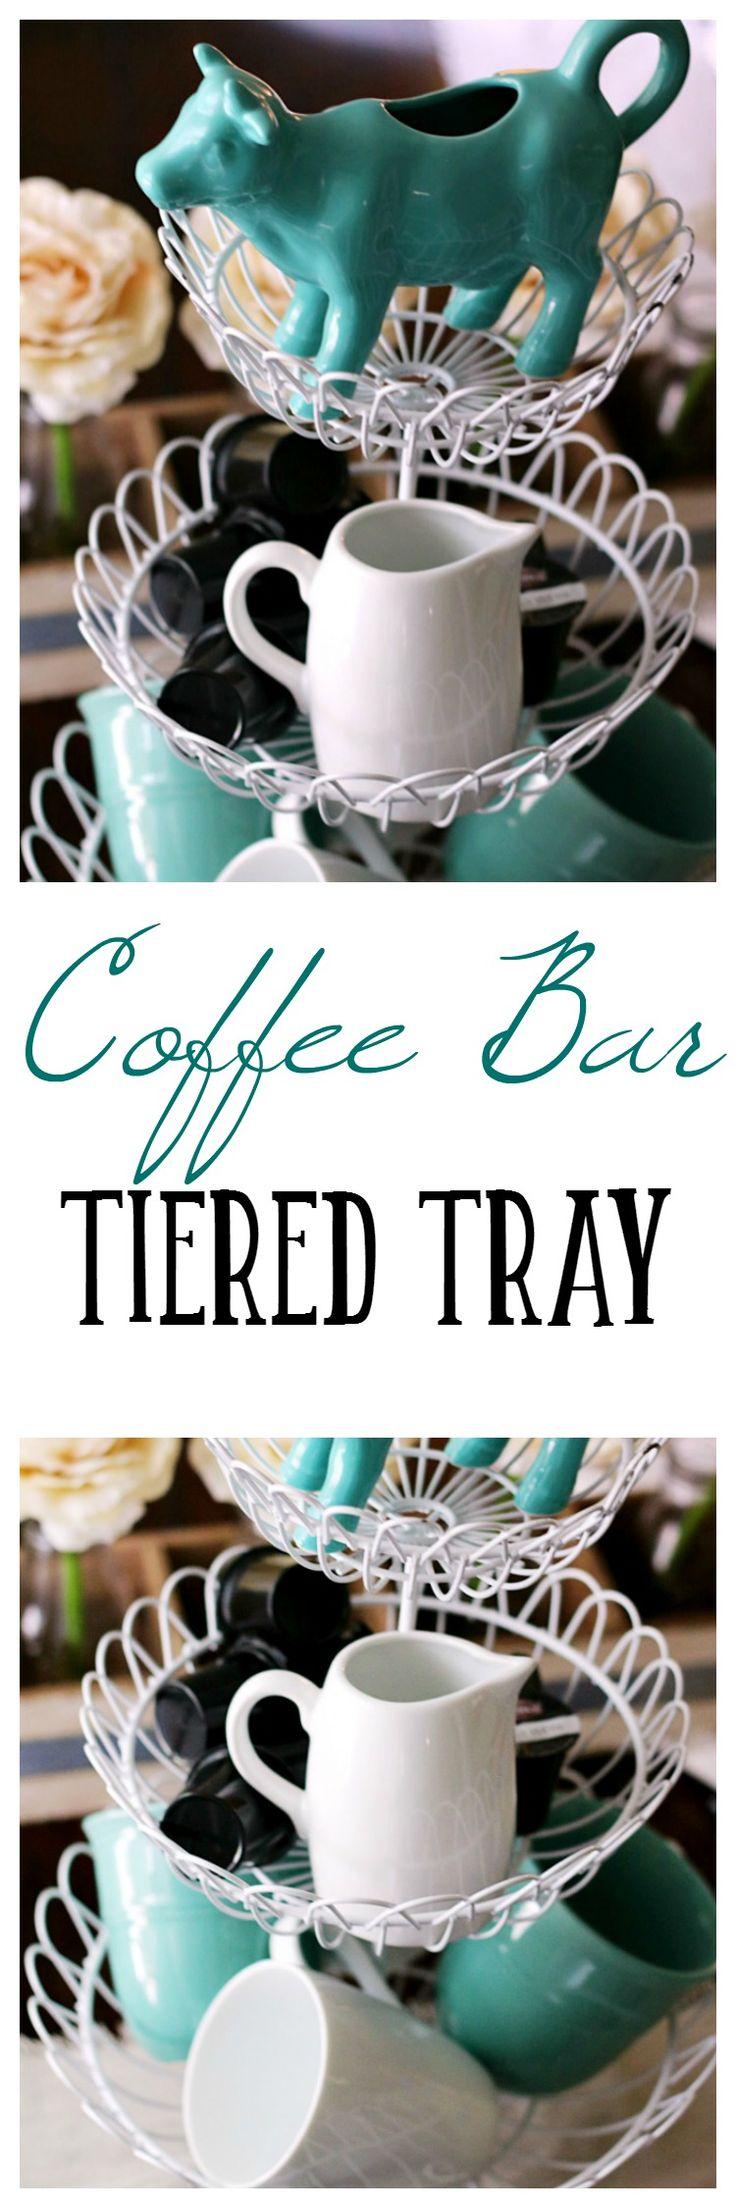 935 best COFFEE / TEA BARS images on Pinterest | Coffee nook, Coffee ...